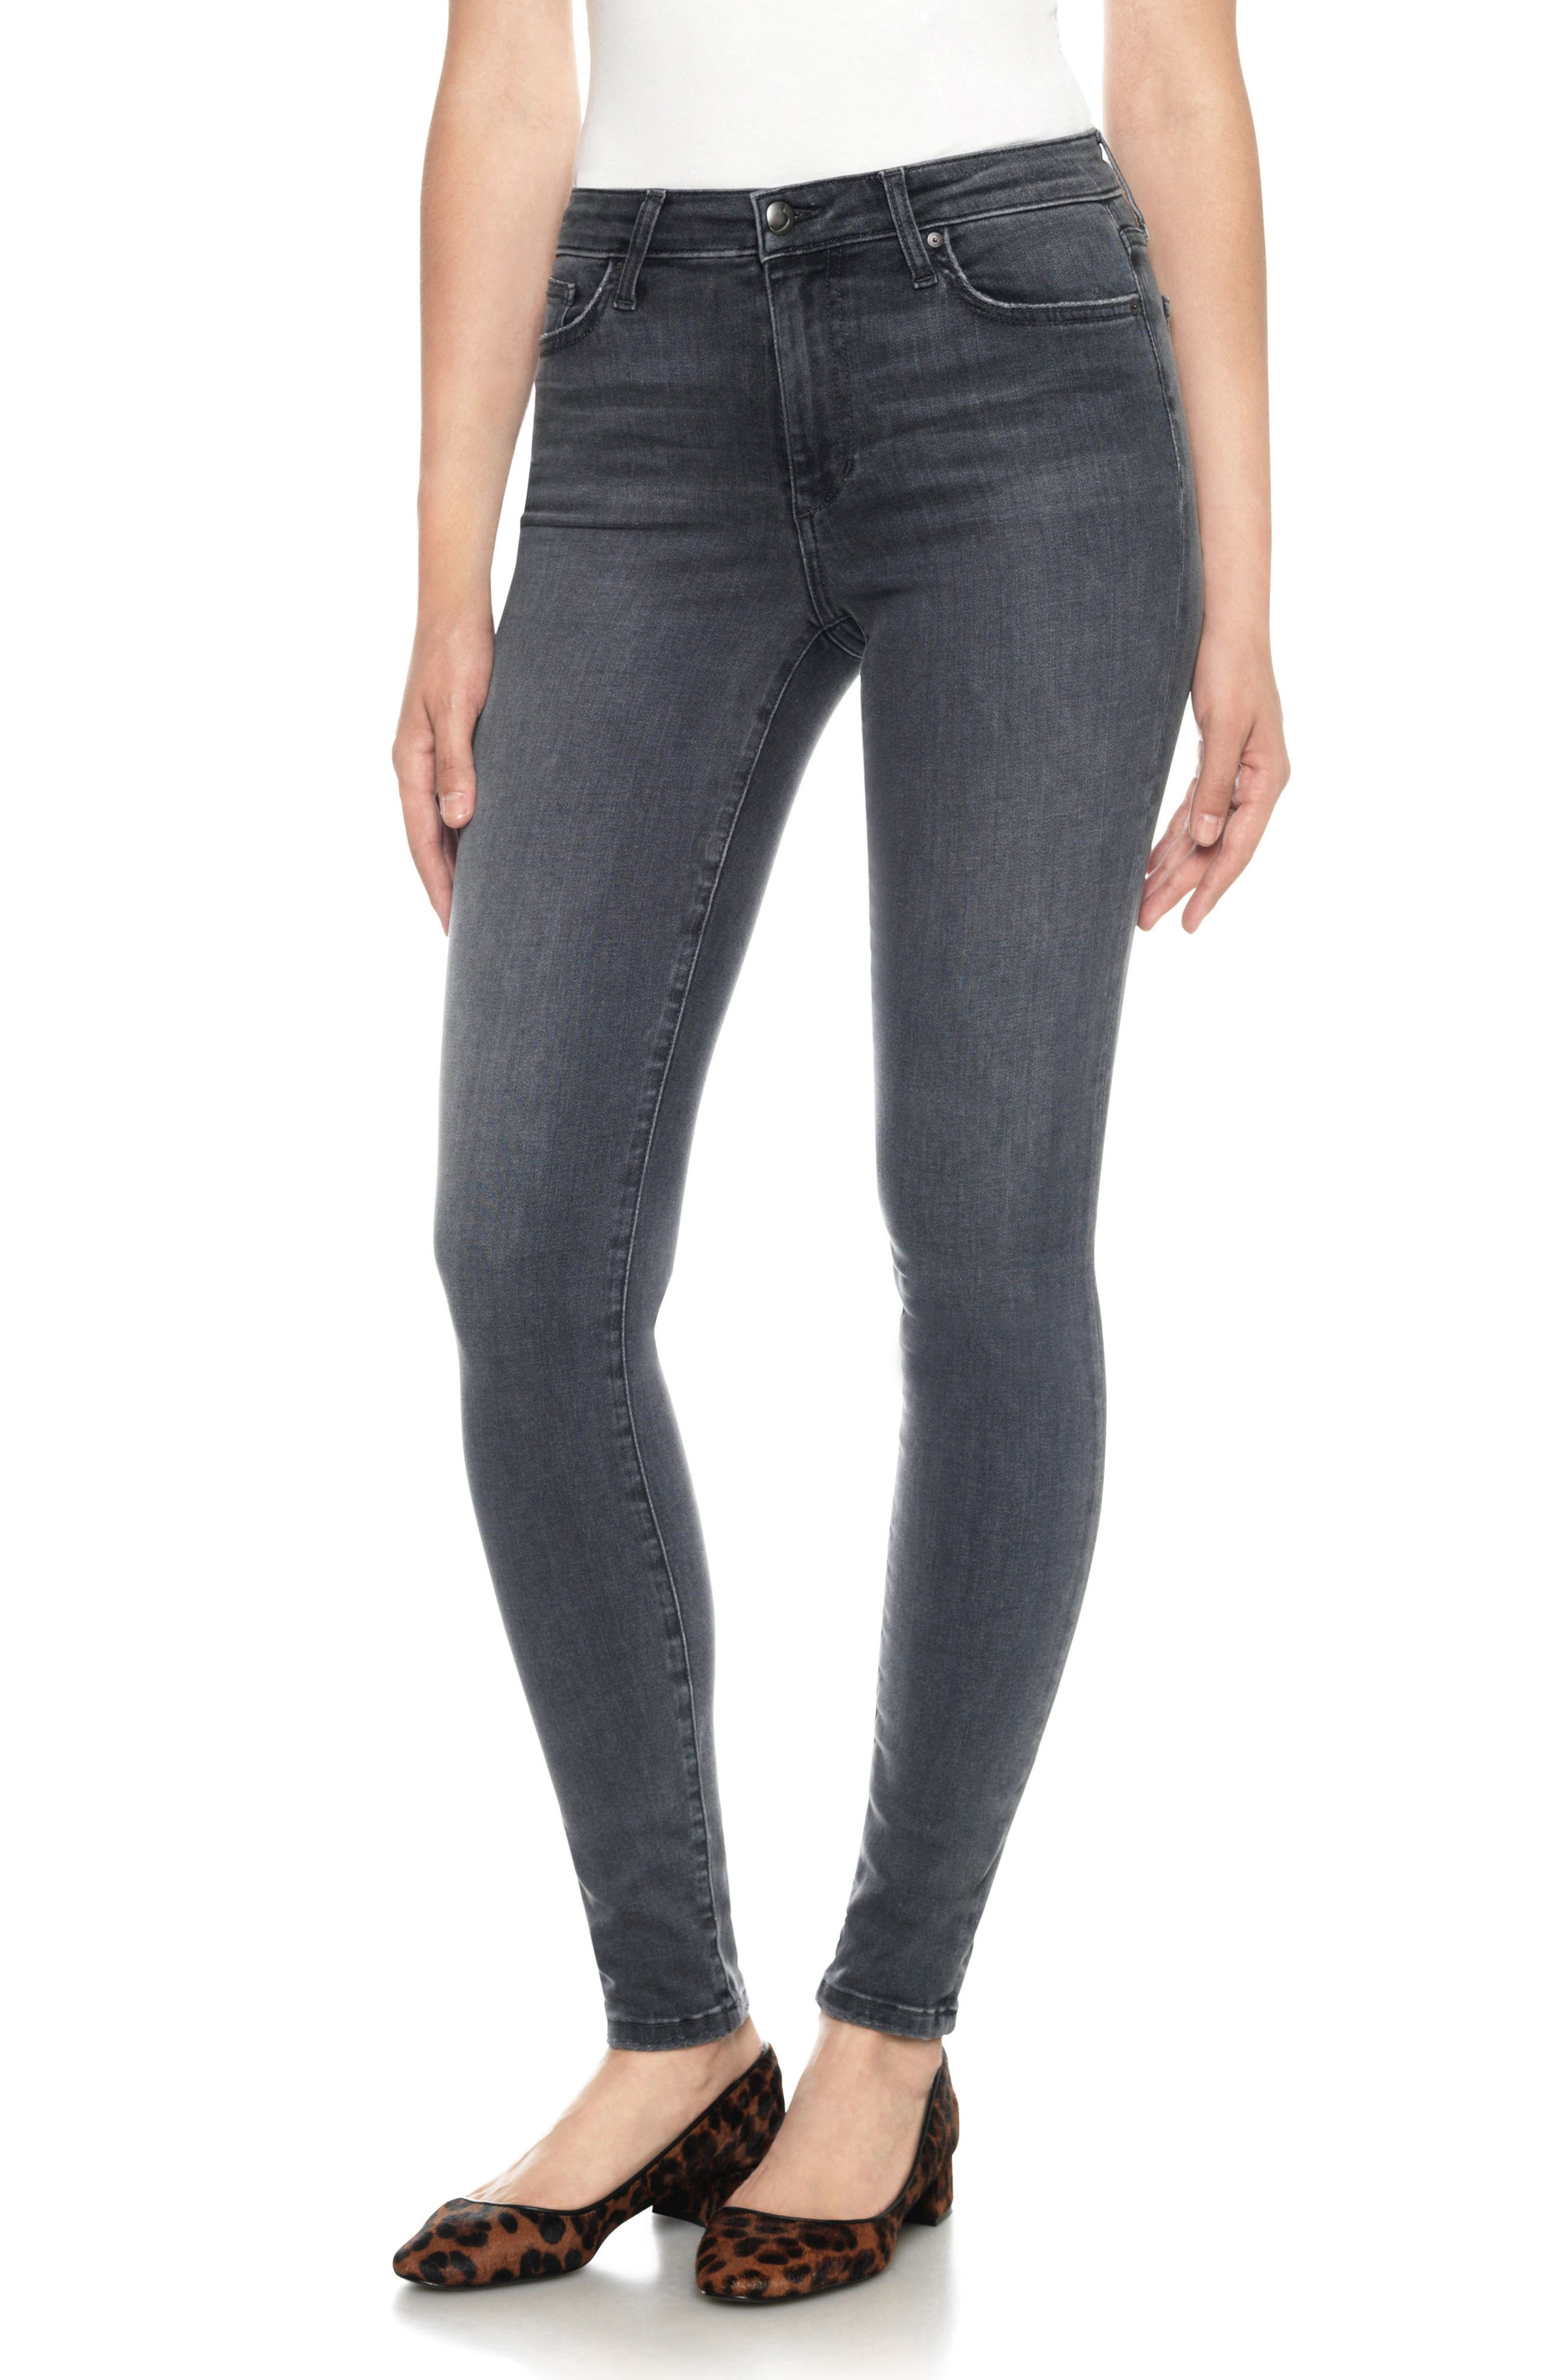 Main Image - Joe's Flawless - Charlie High Waist Skinny Jeans (Callista)